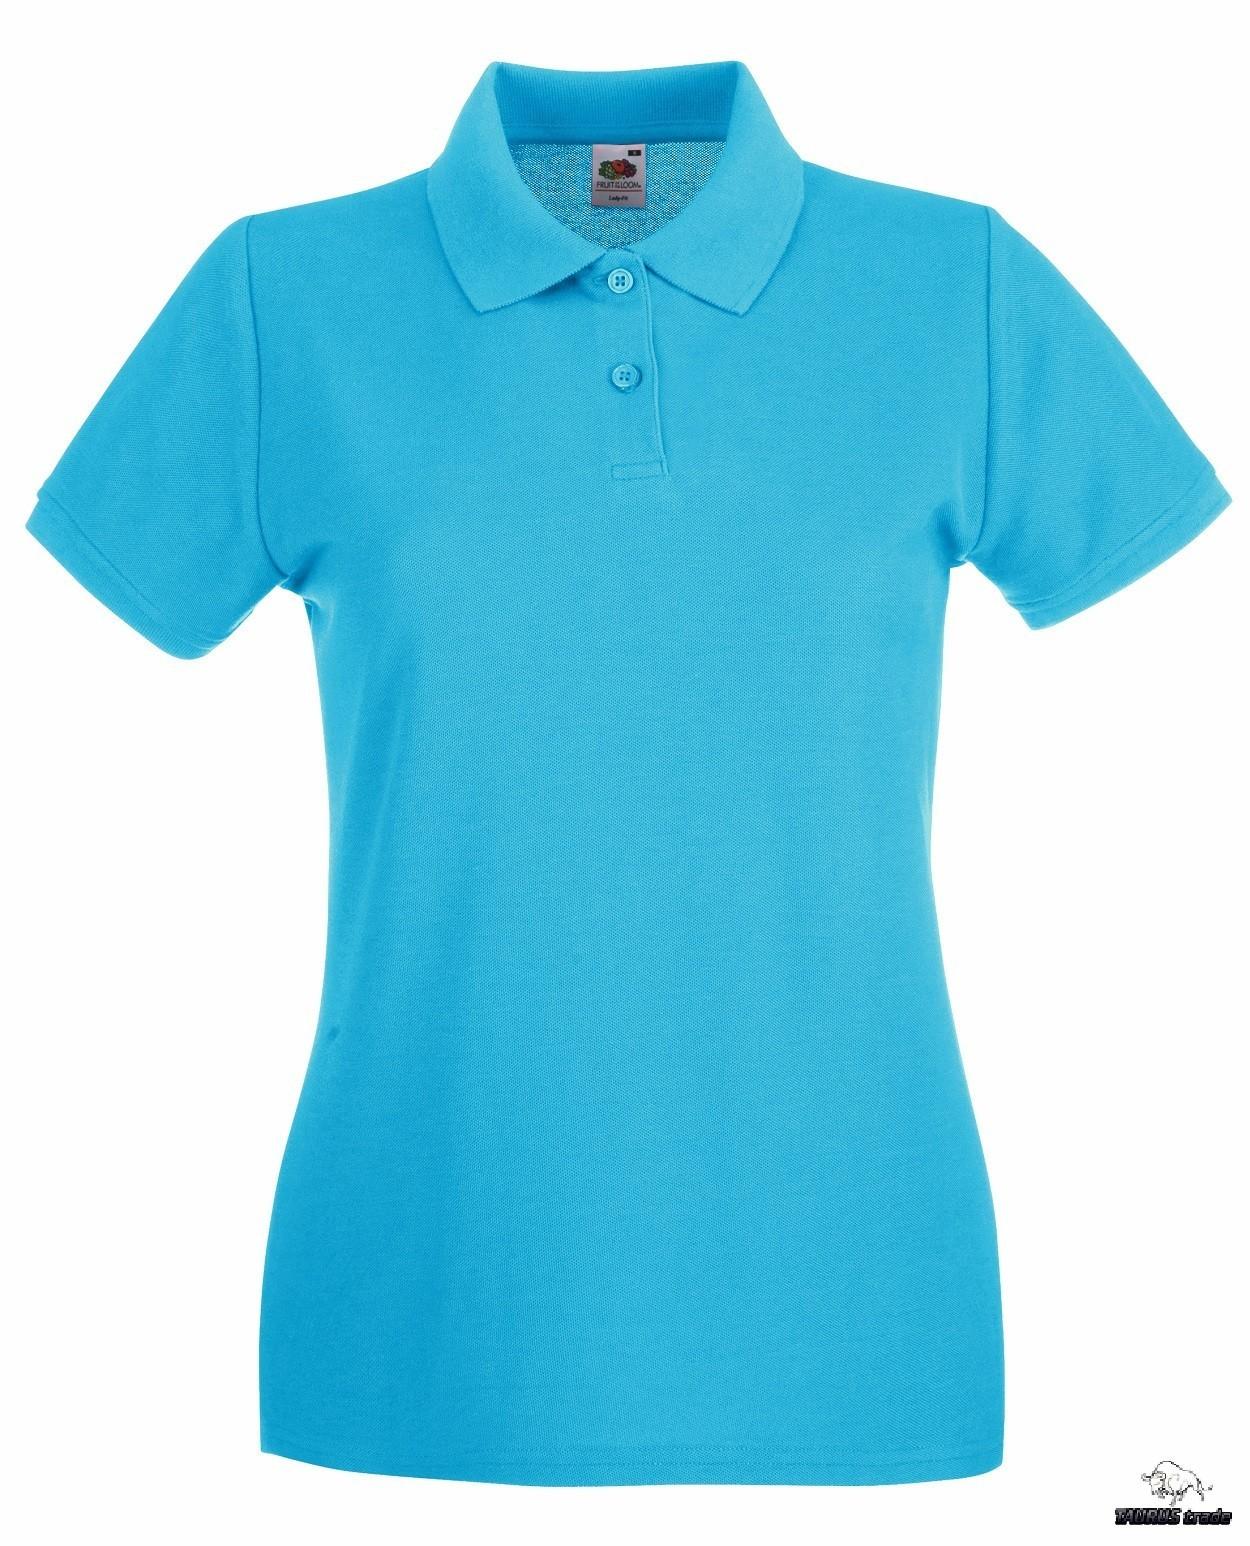 63-030-azure blue